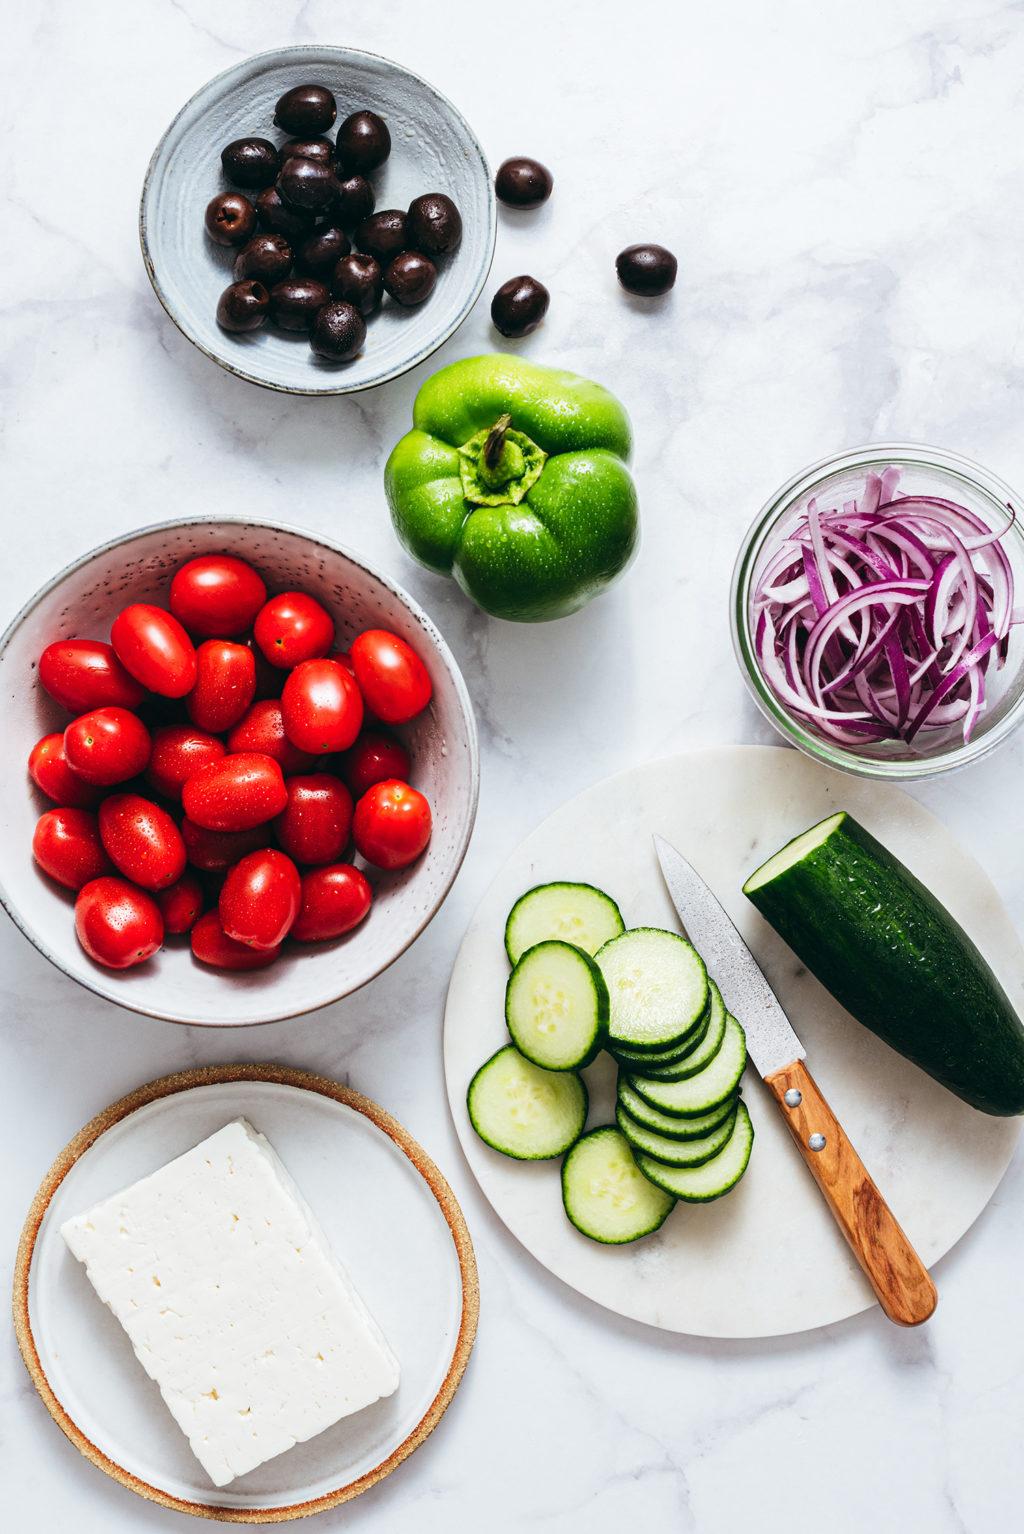 Salade grecque ingrédients - Lilie Bakery